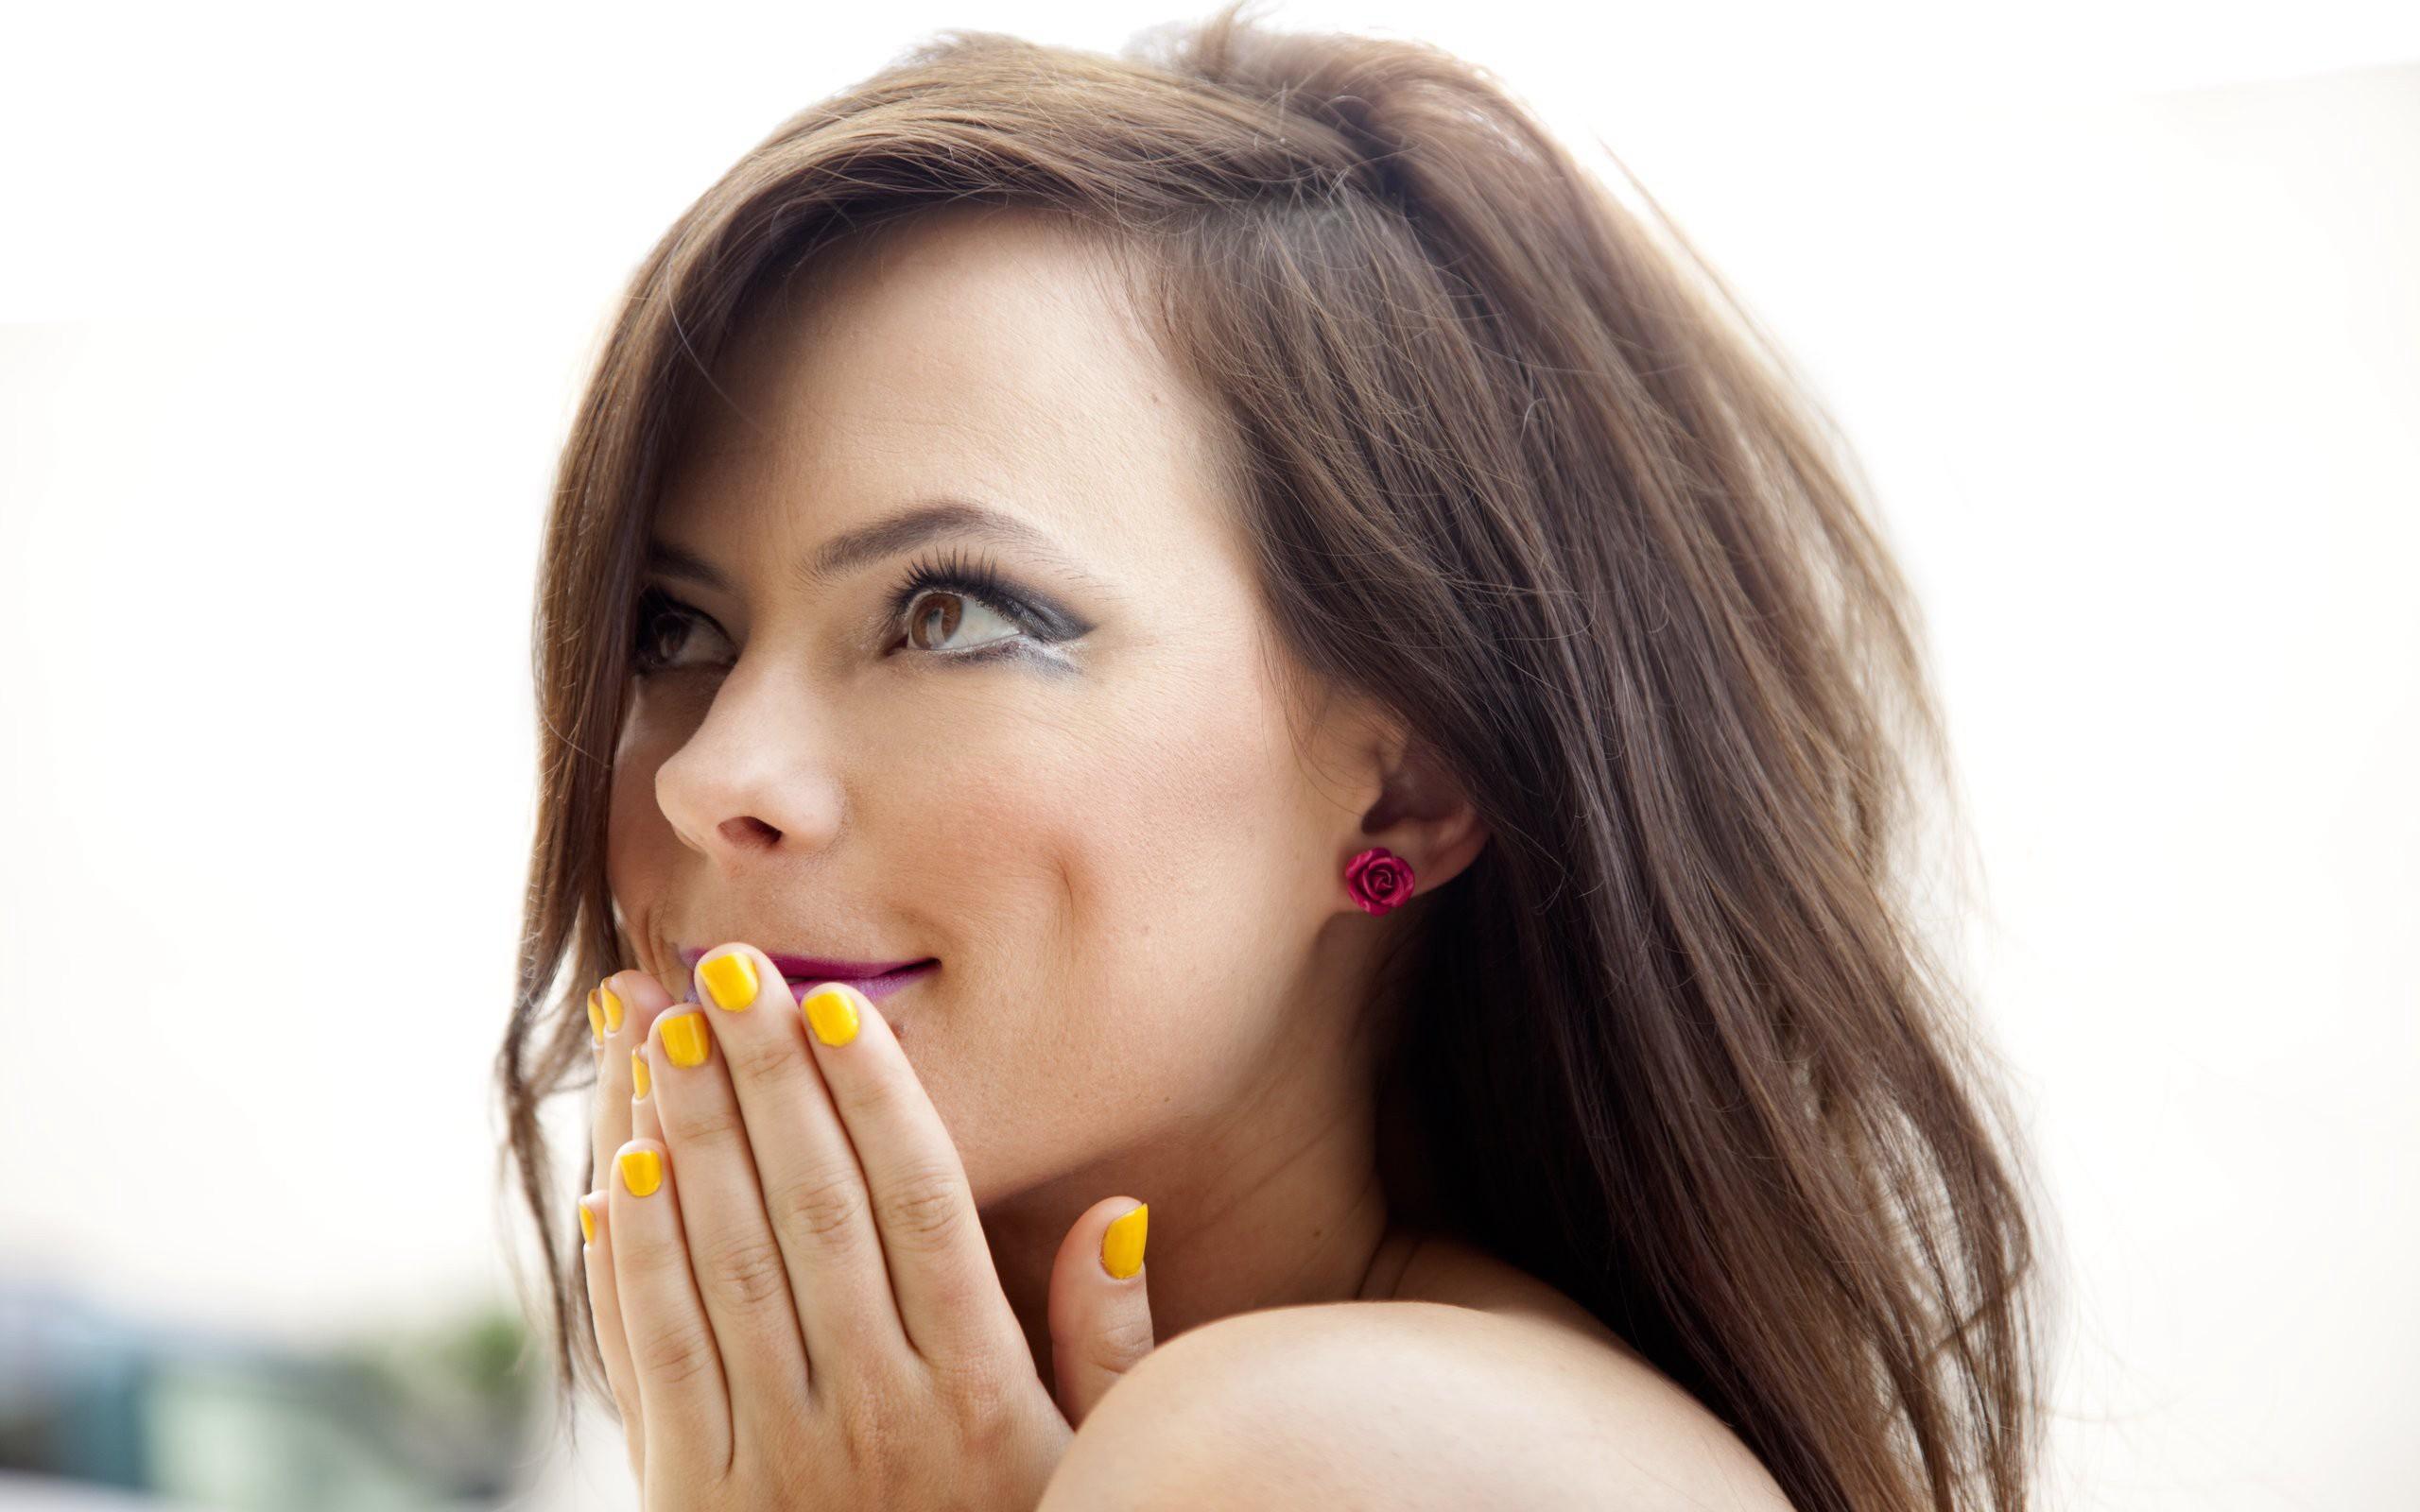 Lenka Kripac con uñas amarillas - 2560x1600